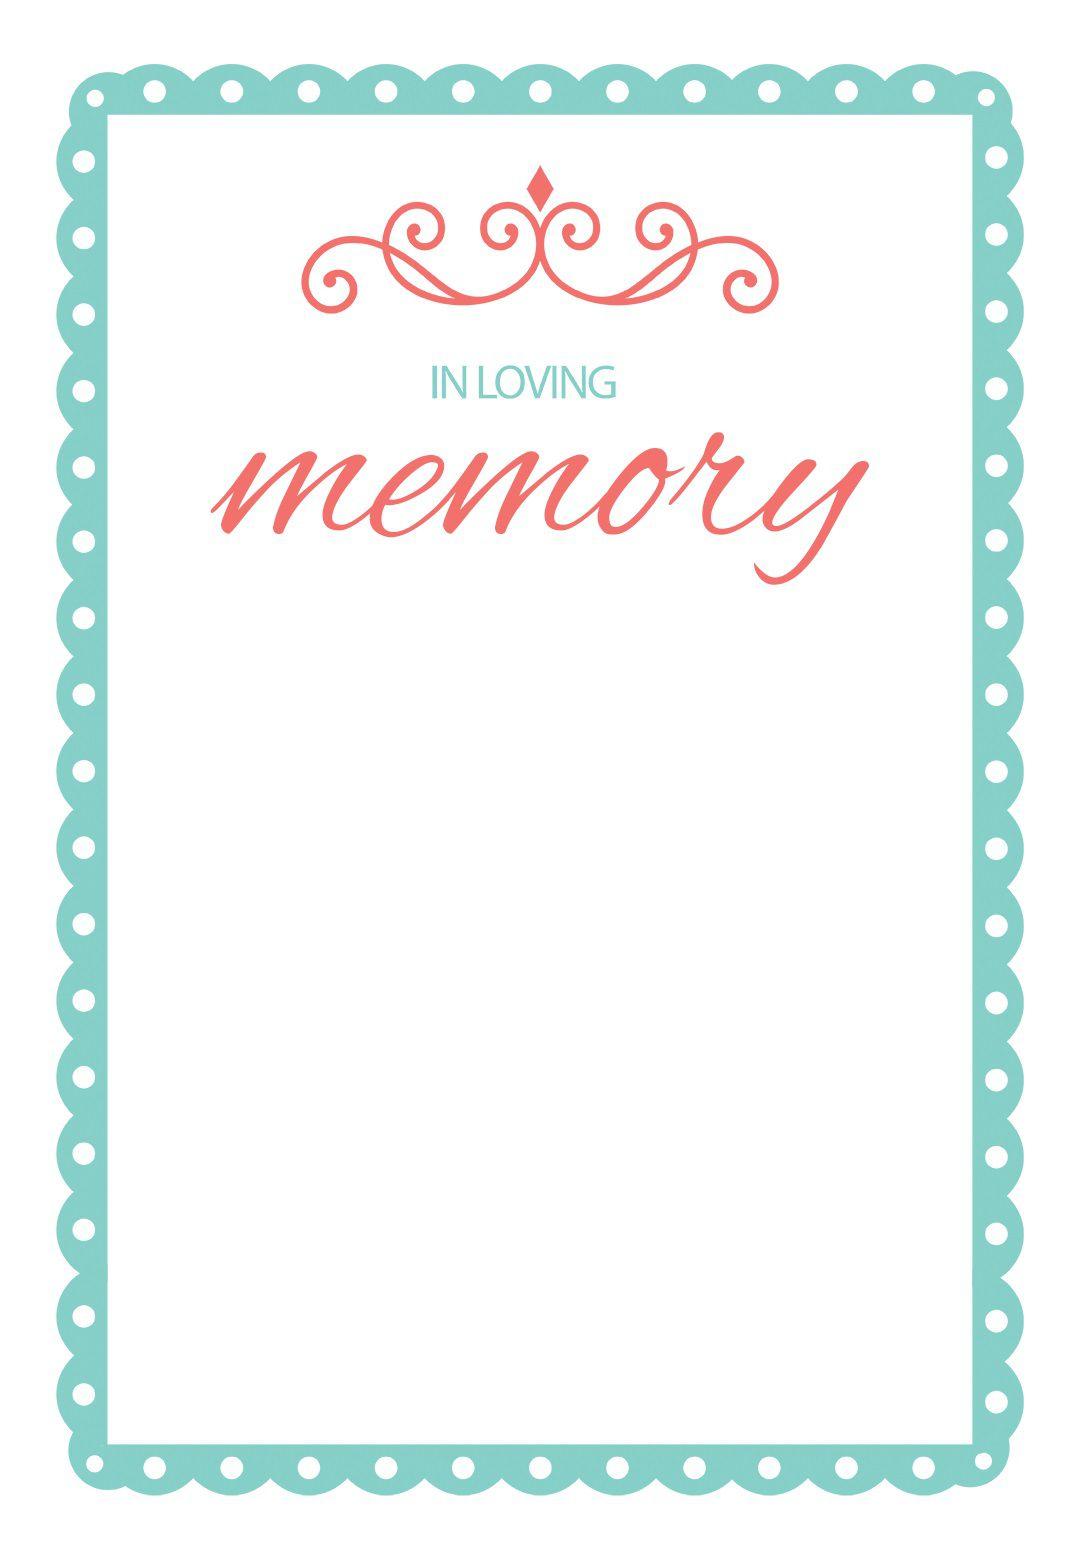 000 Impressive In Loving Memory Template Design  Free PowerpointFull